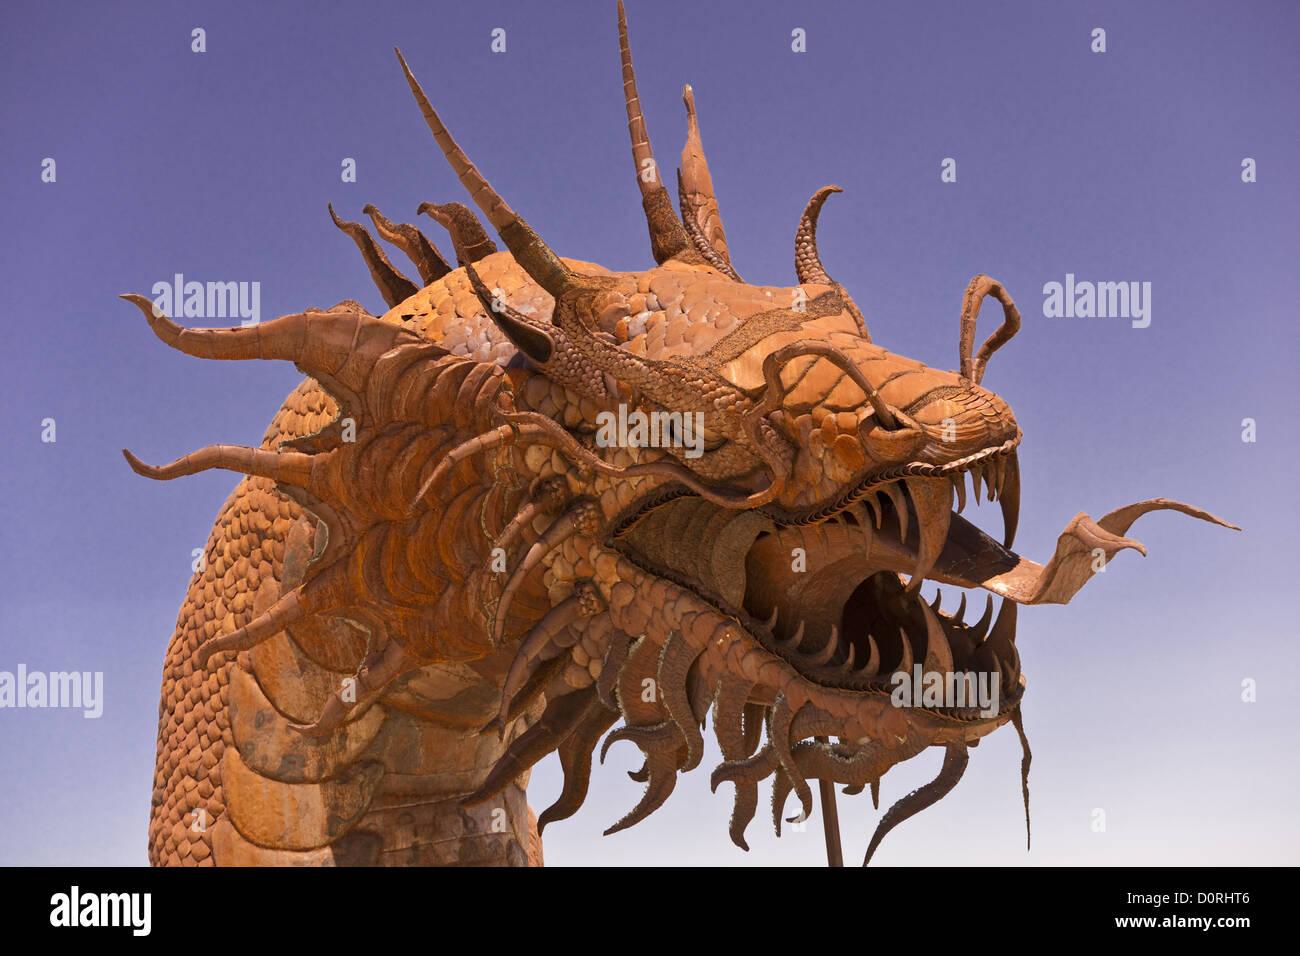 The Dragon of Myth - Stock Image